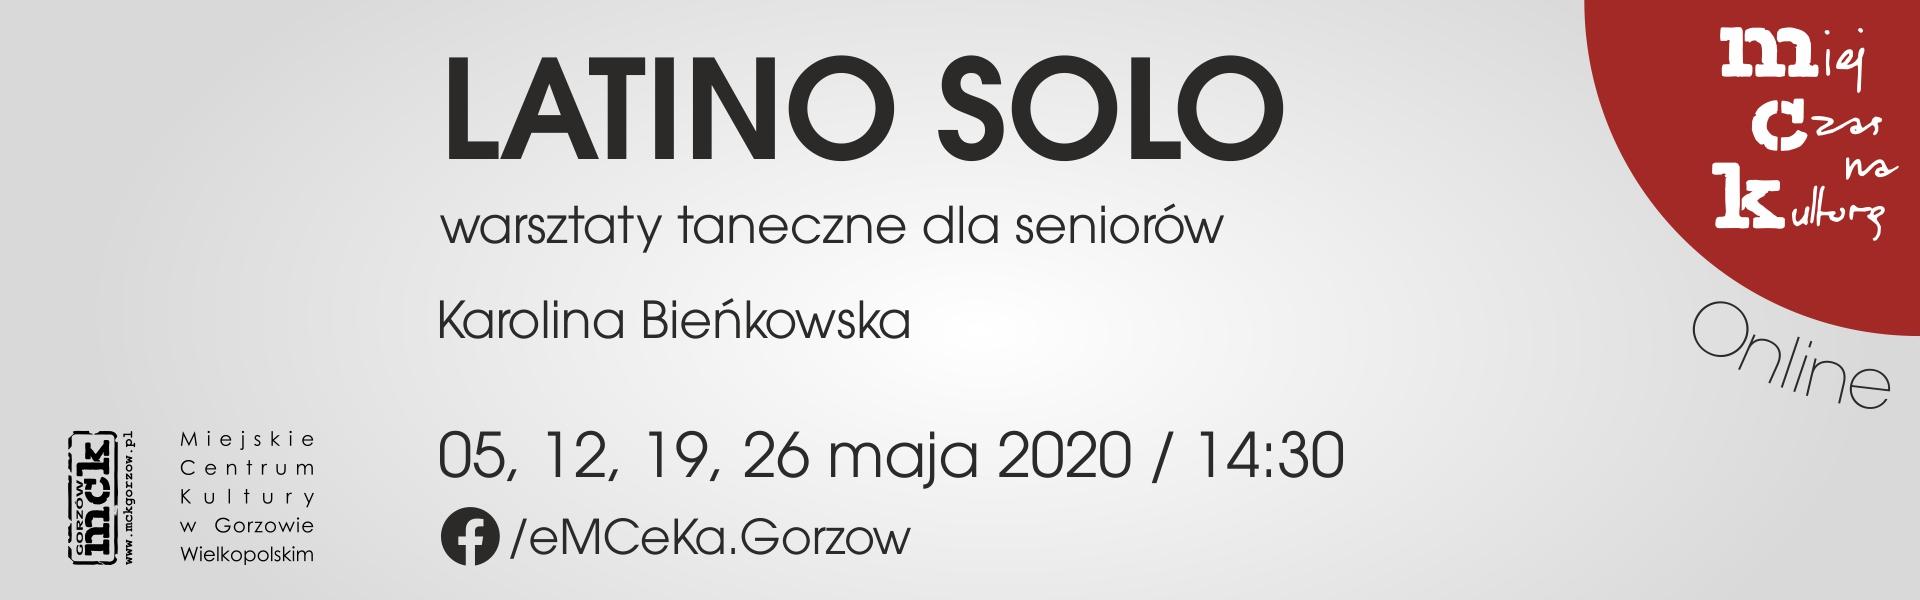 Warsztaty Latno Solo